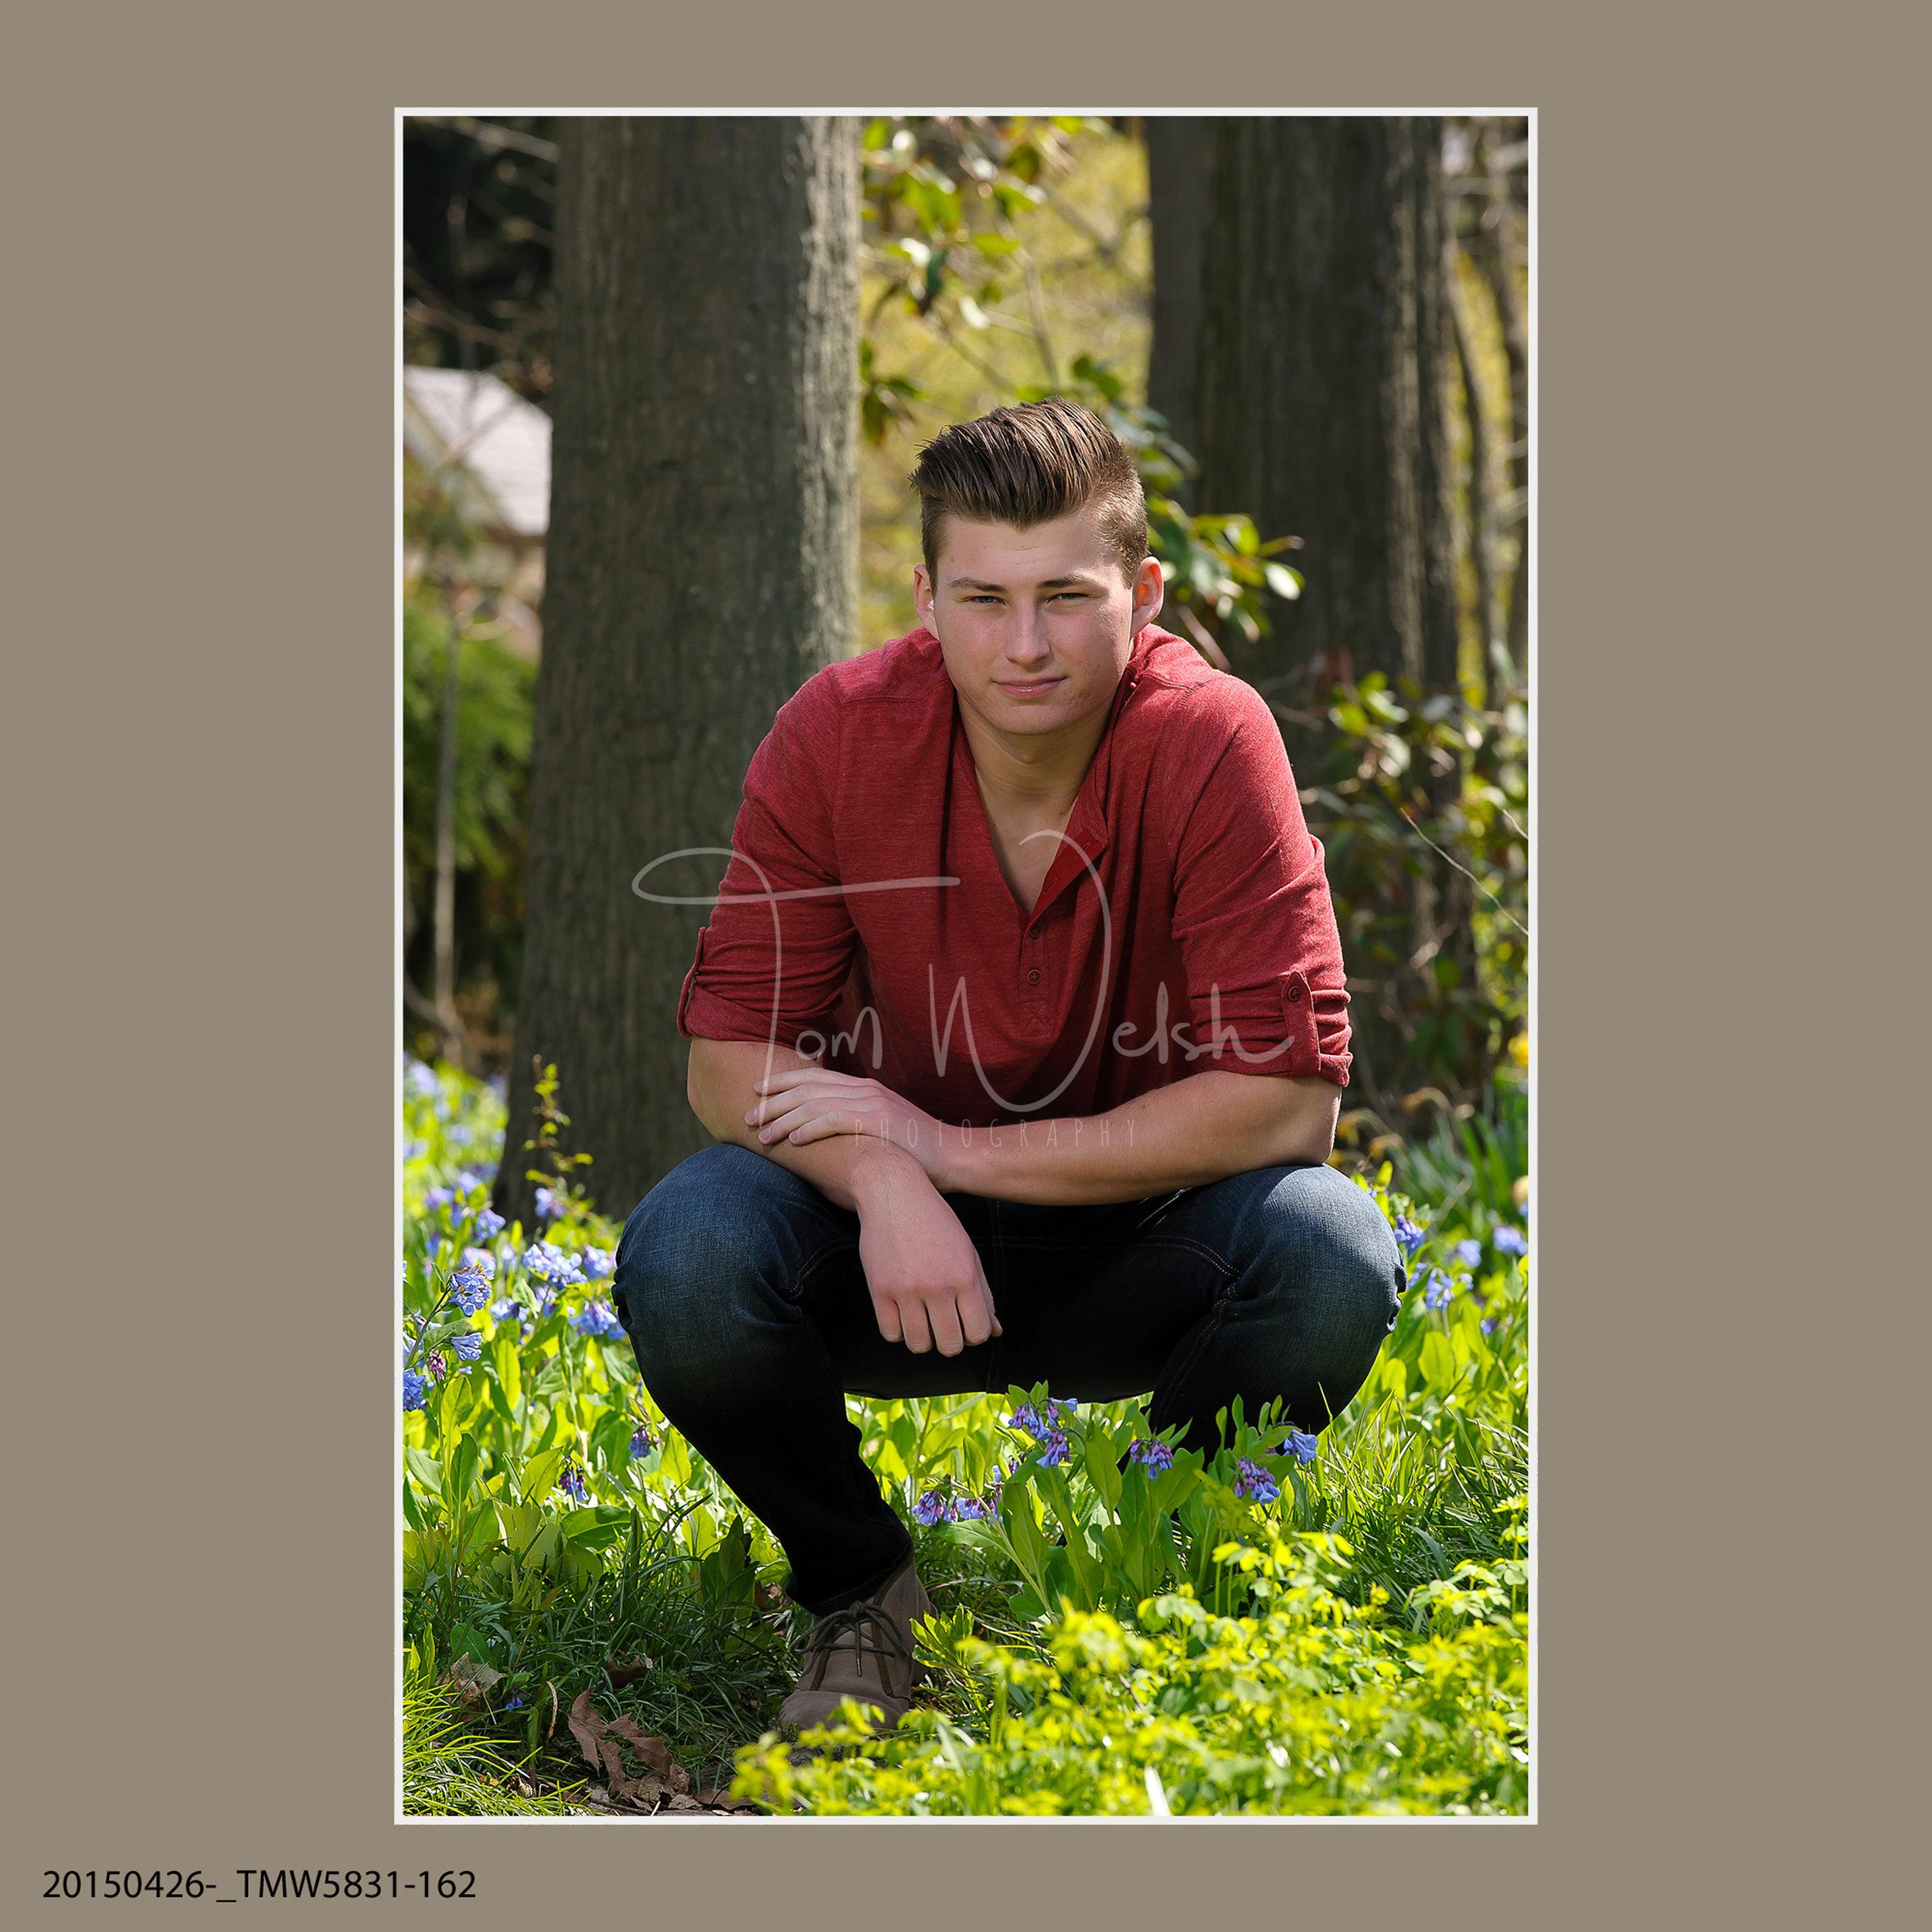 20150426-_TMW5831-162.jpg